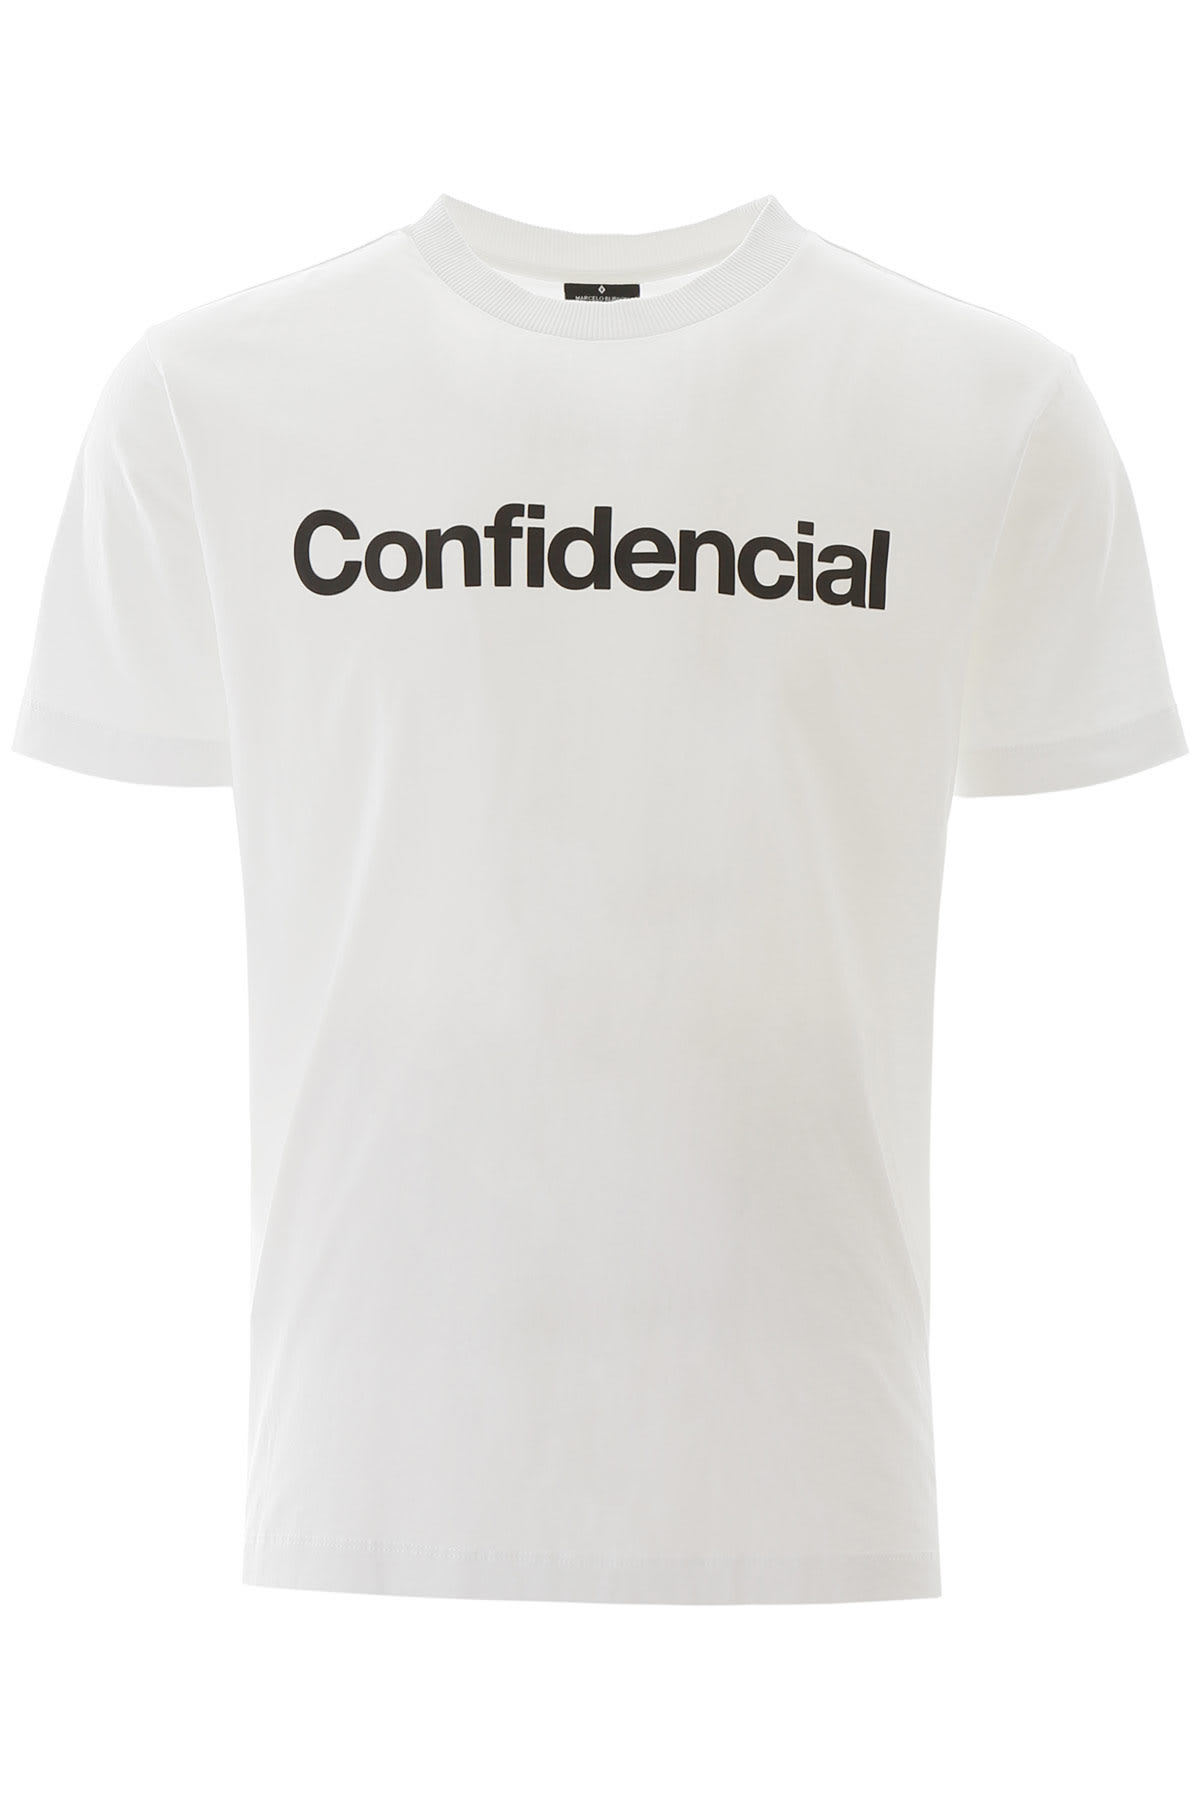 Marcelo Burlon Confidencial Print T-shirt